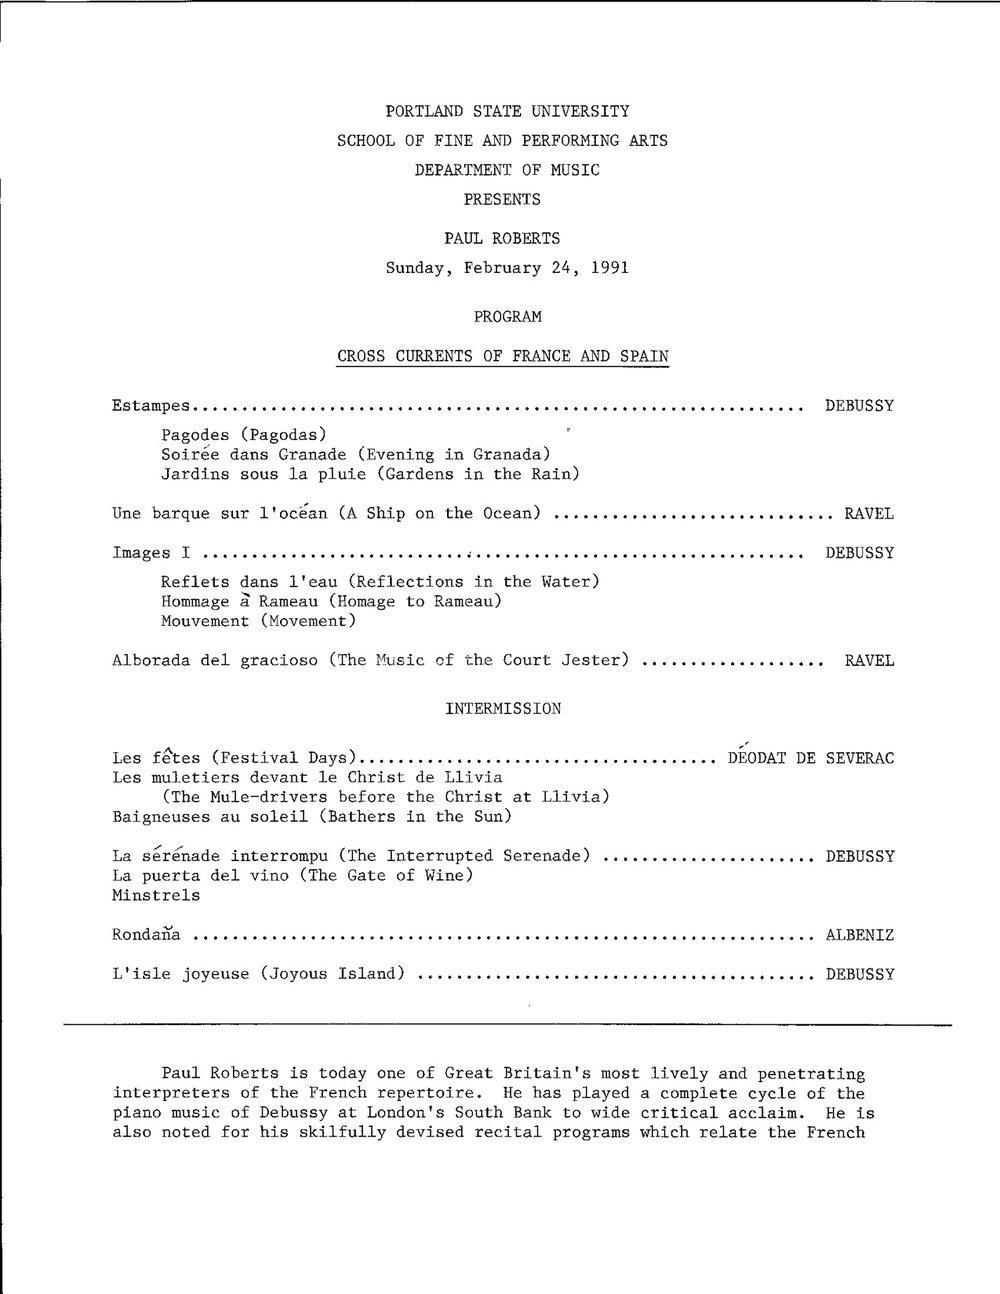 Roberts90-91_Program2.jpg